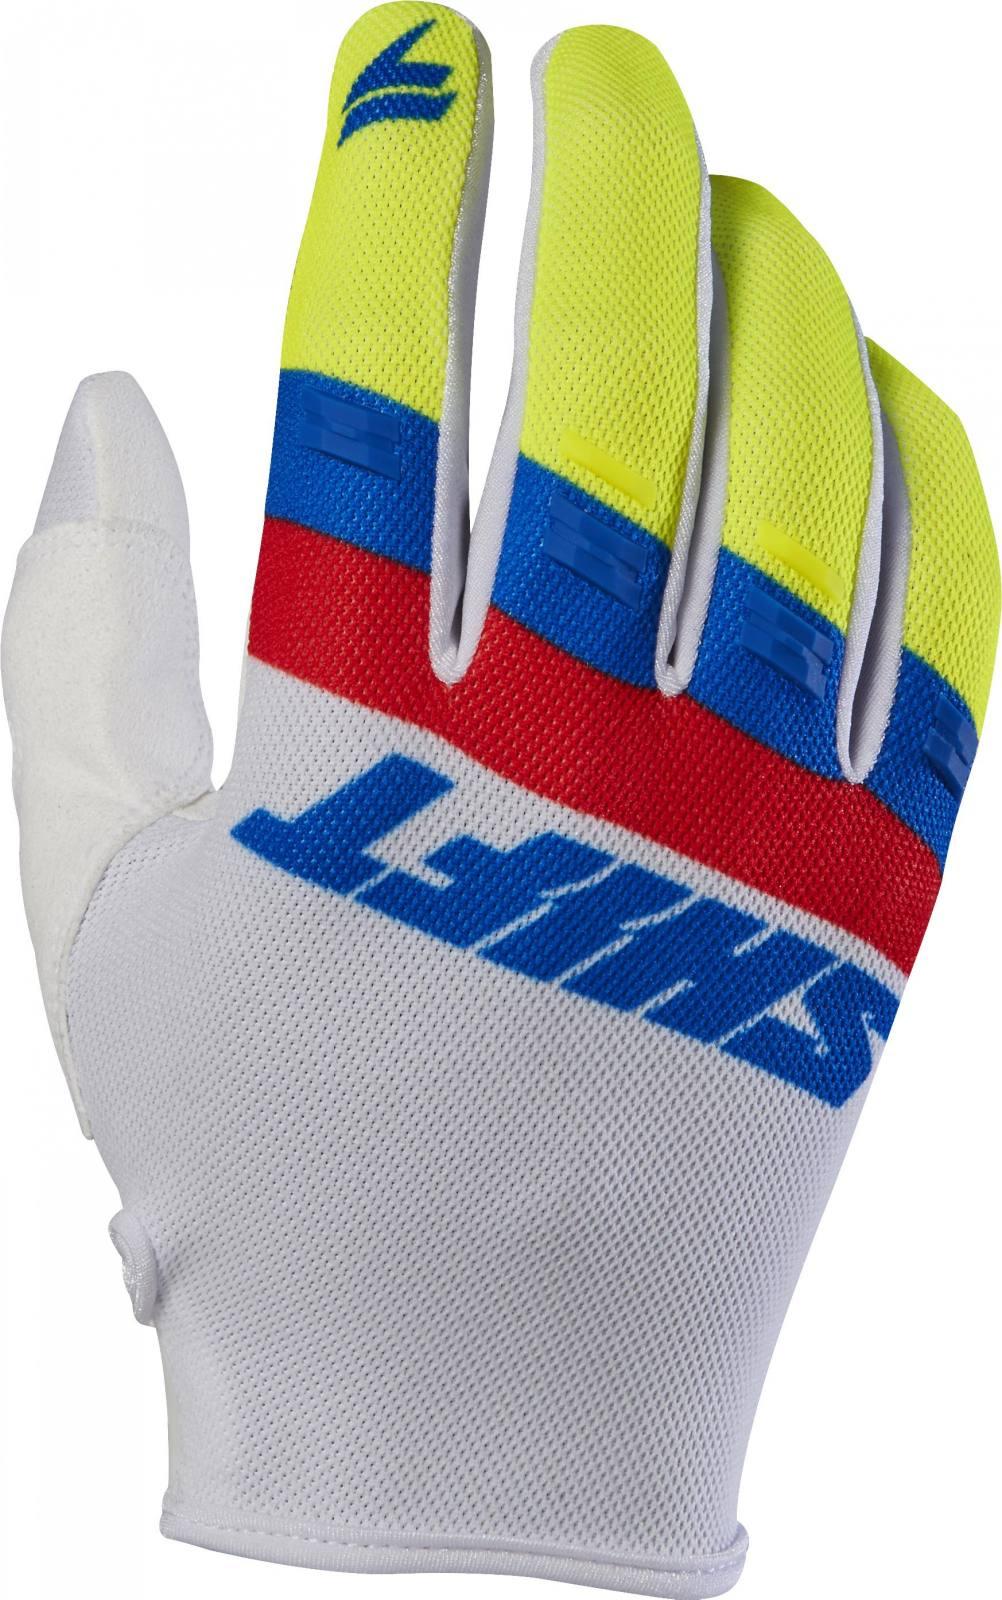 Shift WHIT3 AIR Gloves Pink Black Motorcycle Men;s sized  ATV  Gloves 19098-285